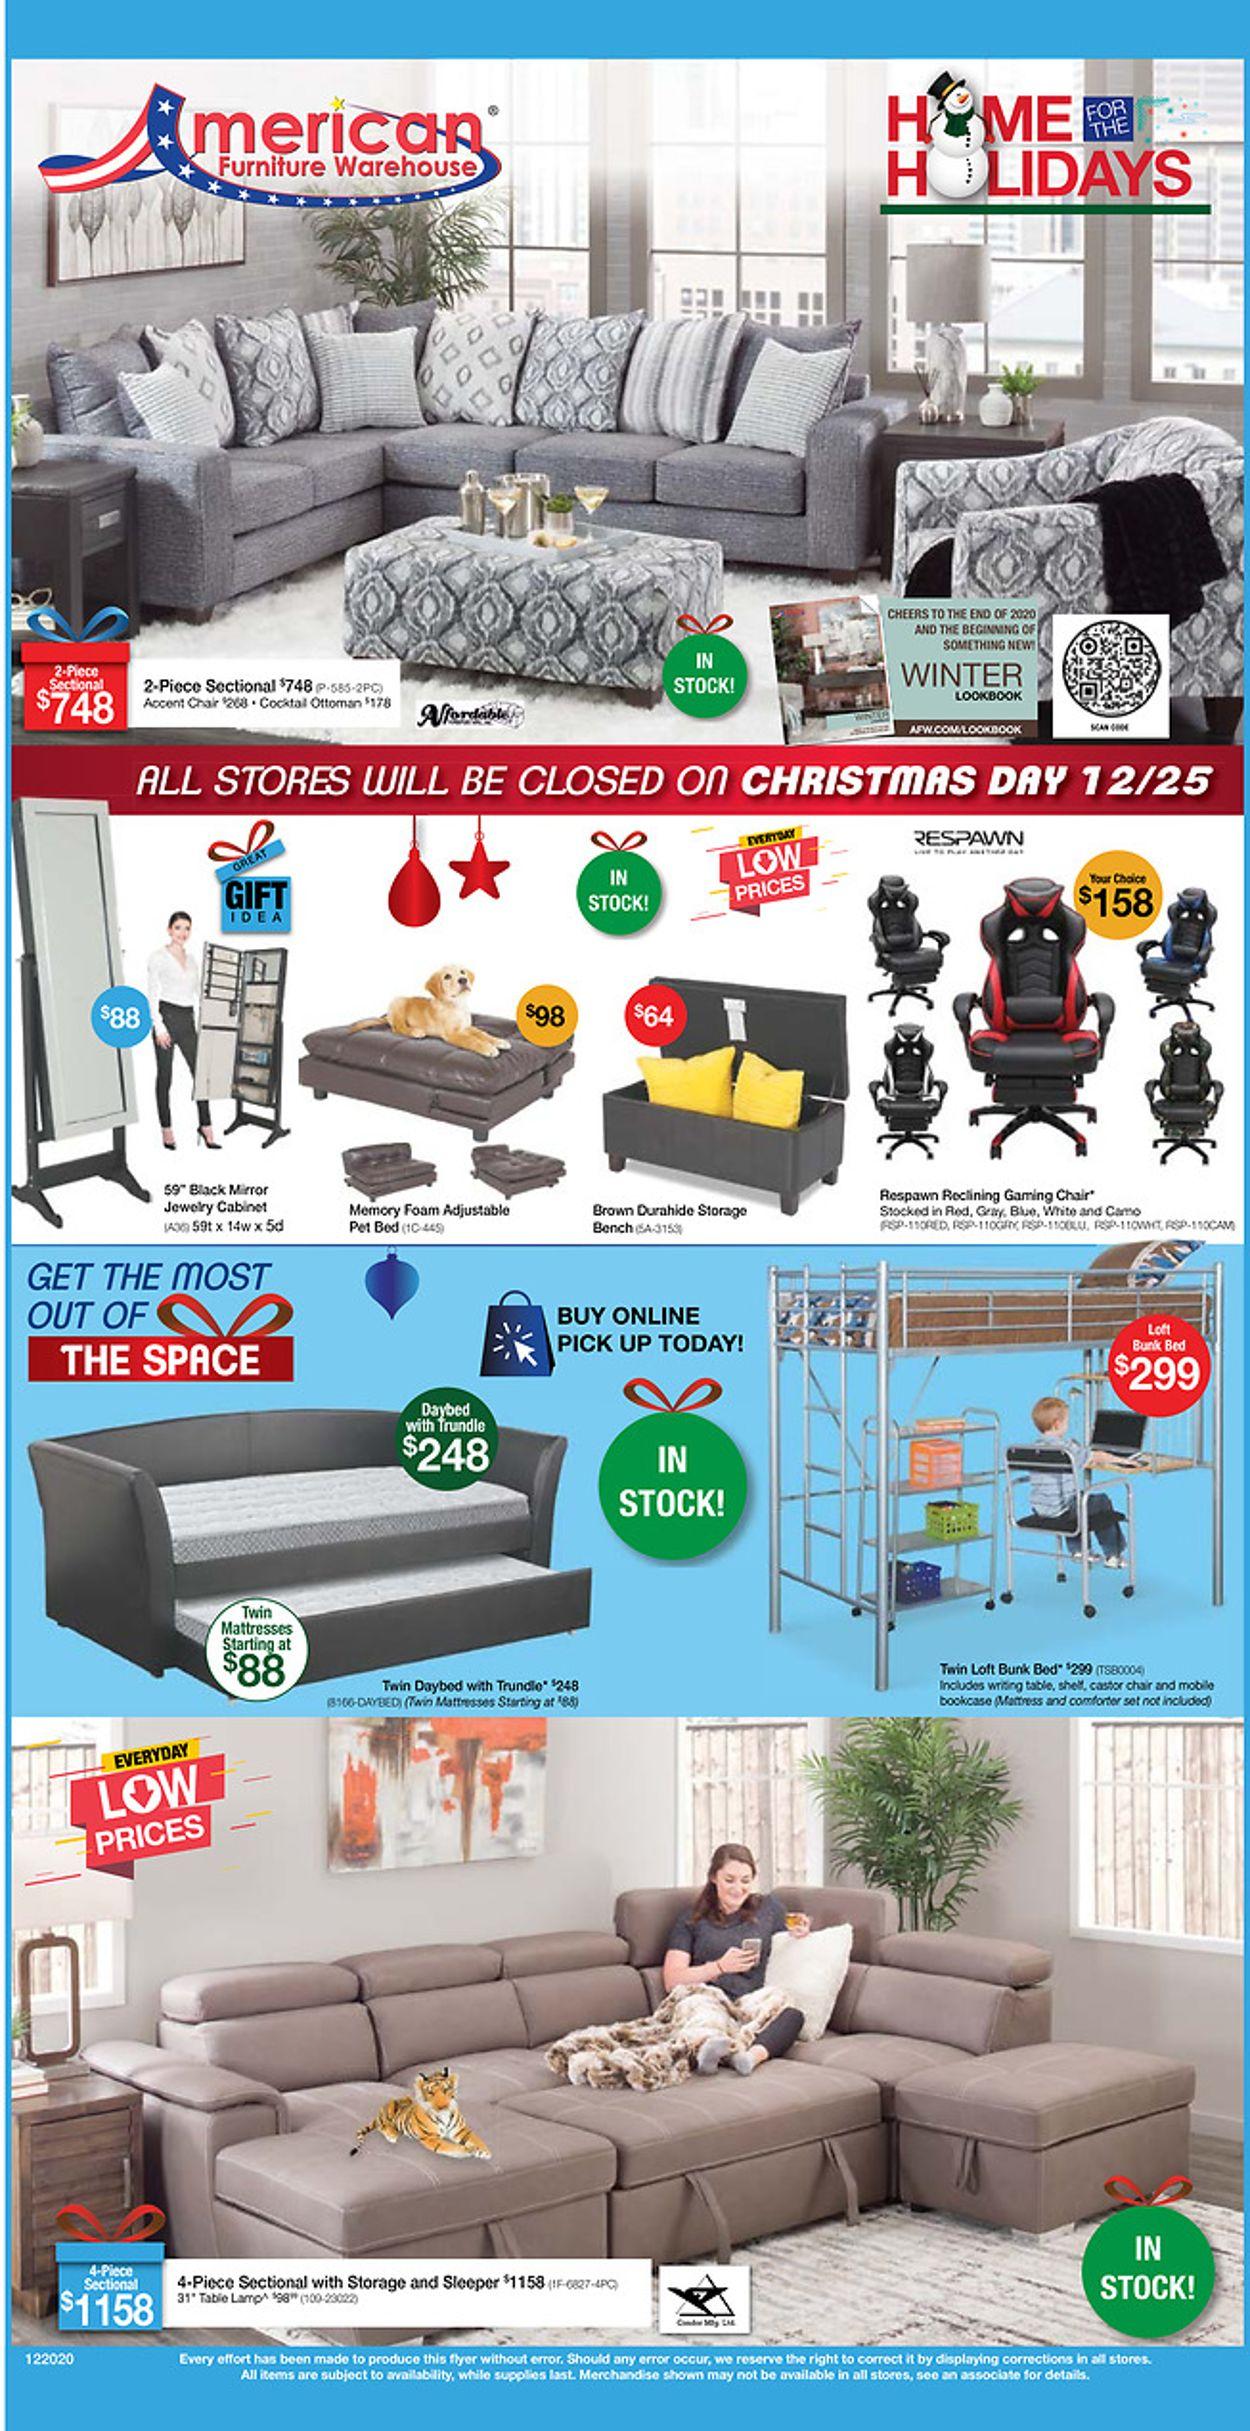 American Furniture Warehouse Weekly Ad Circular - valid 12/21-12/26/2020